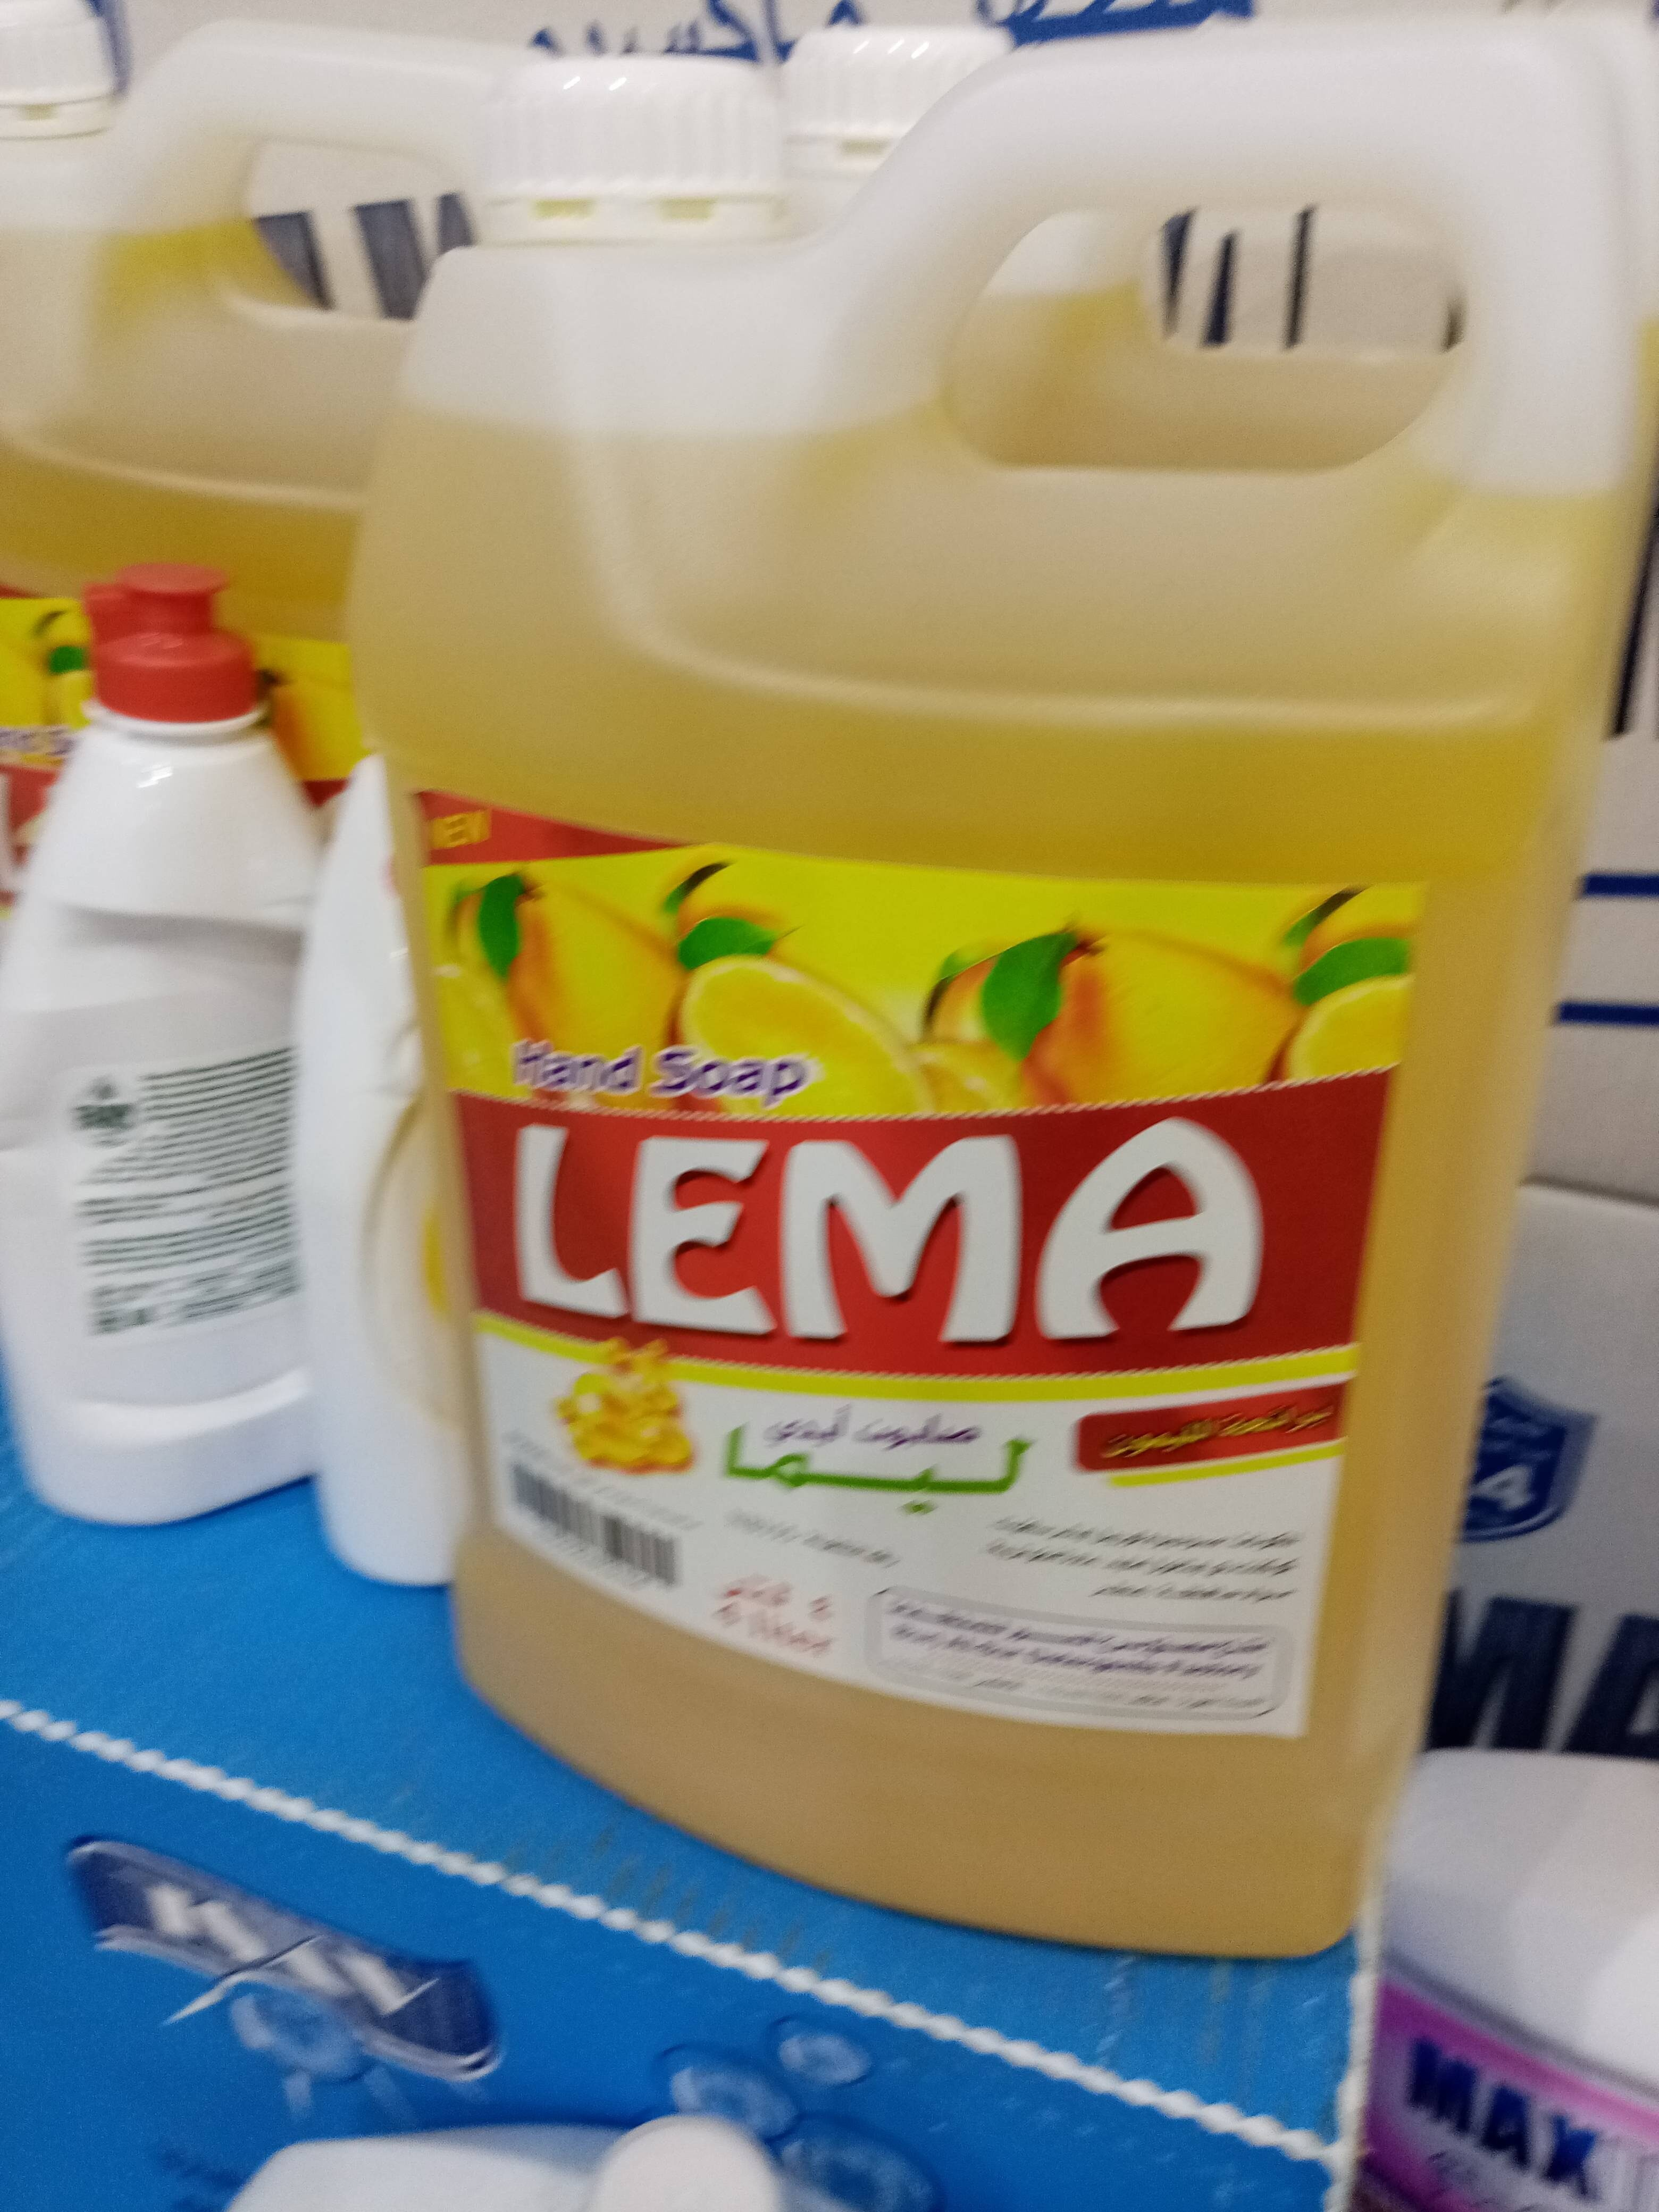 limq - Product - en